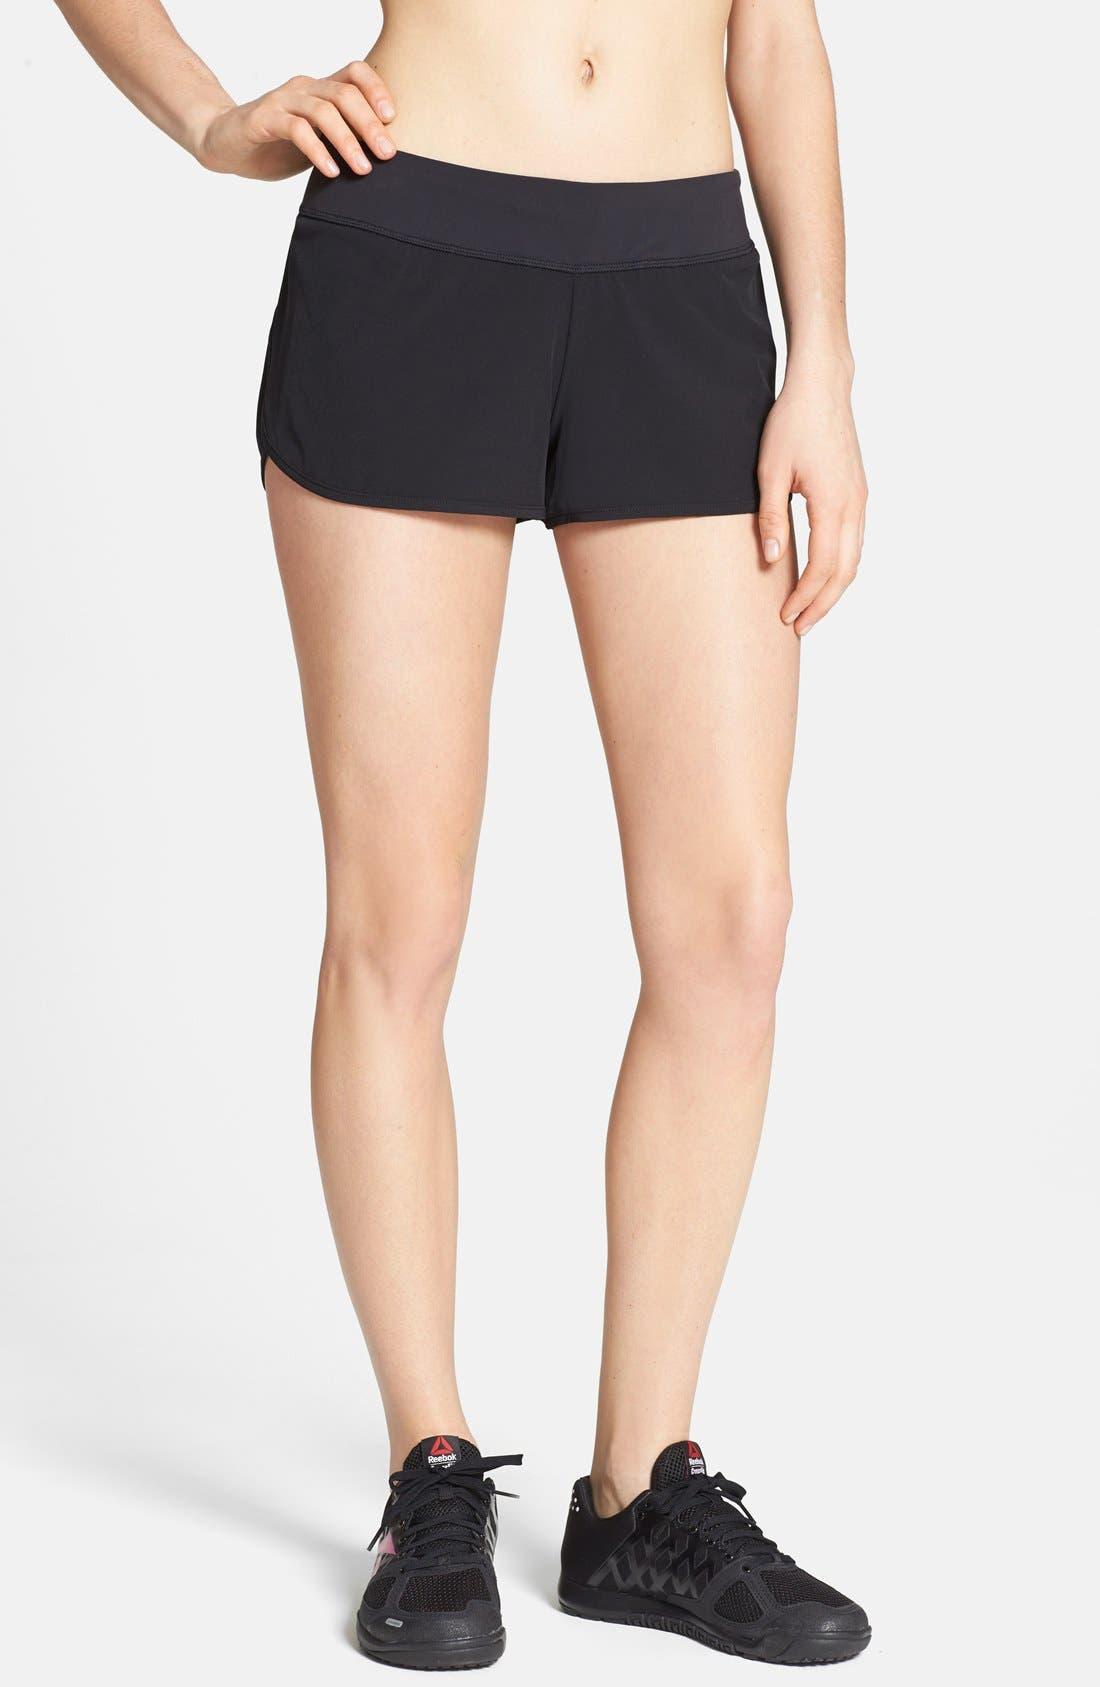 Alternate Image 1 Selected - Reebok CrossFit Shorts